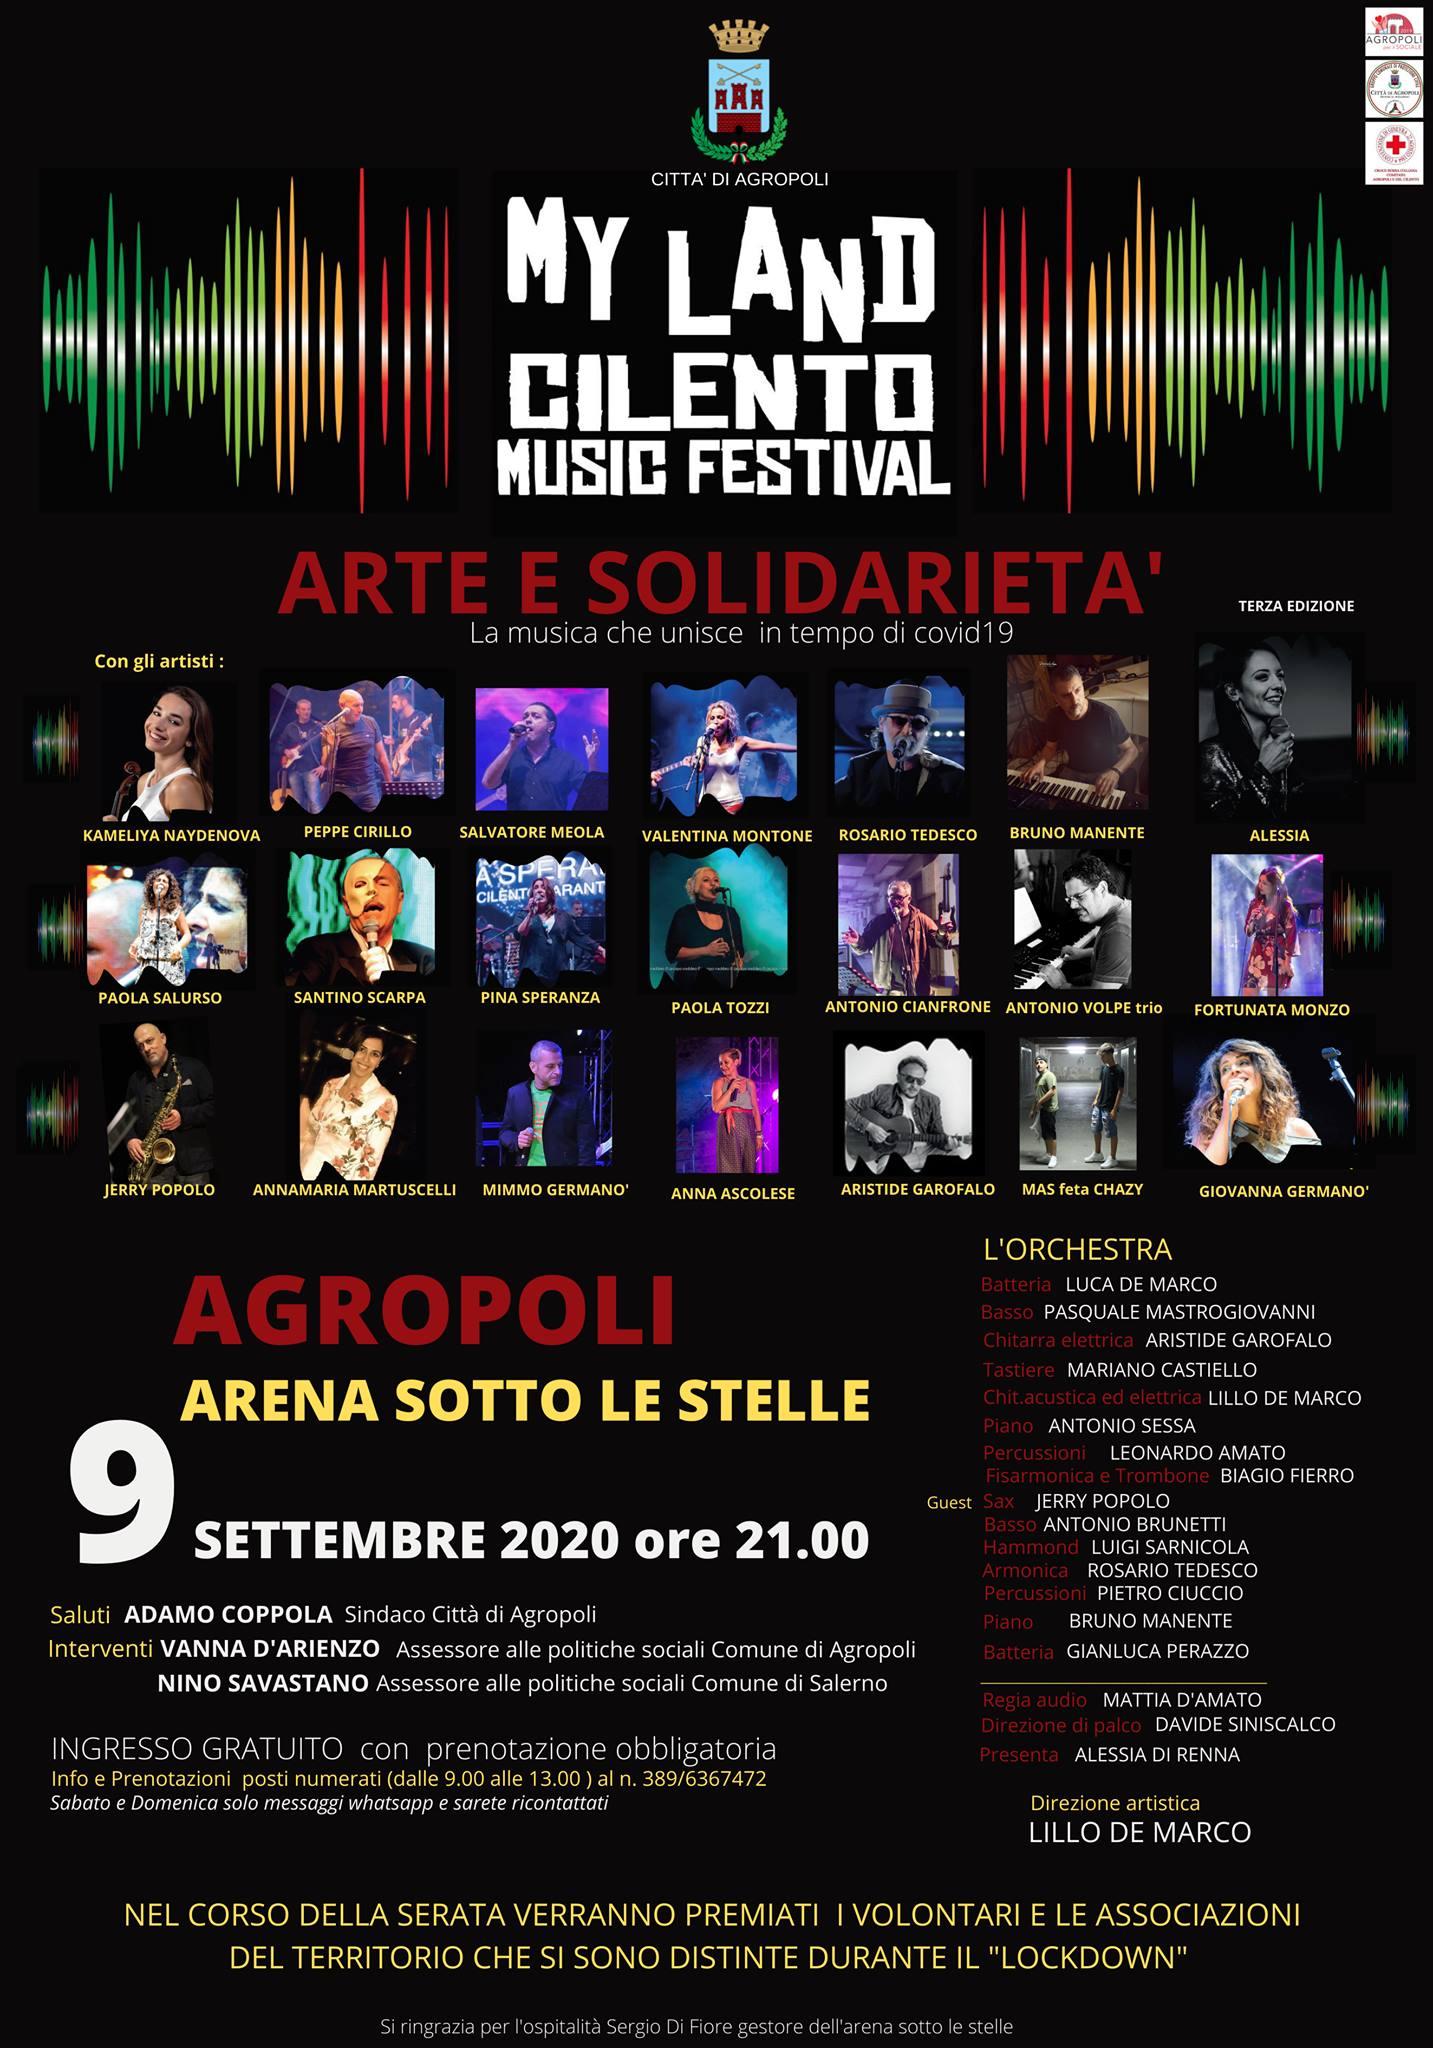 My Land Cilento Music Festival